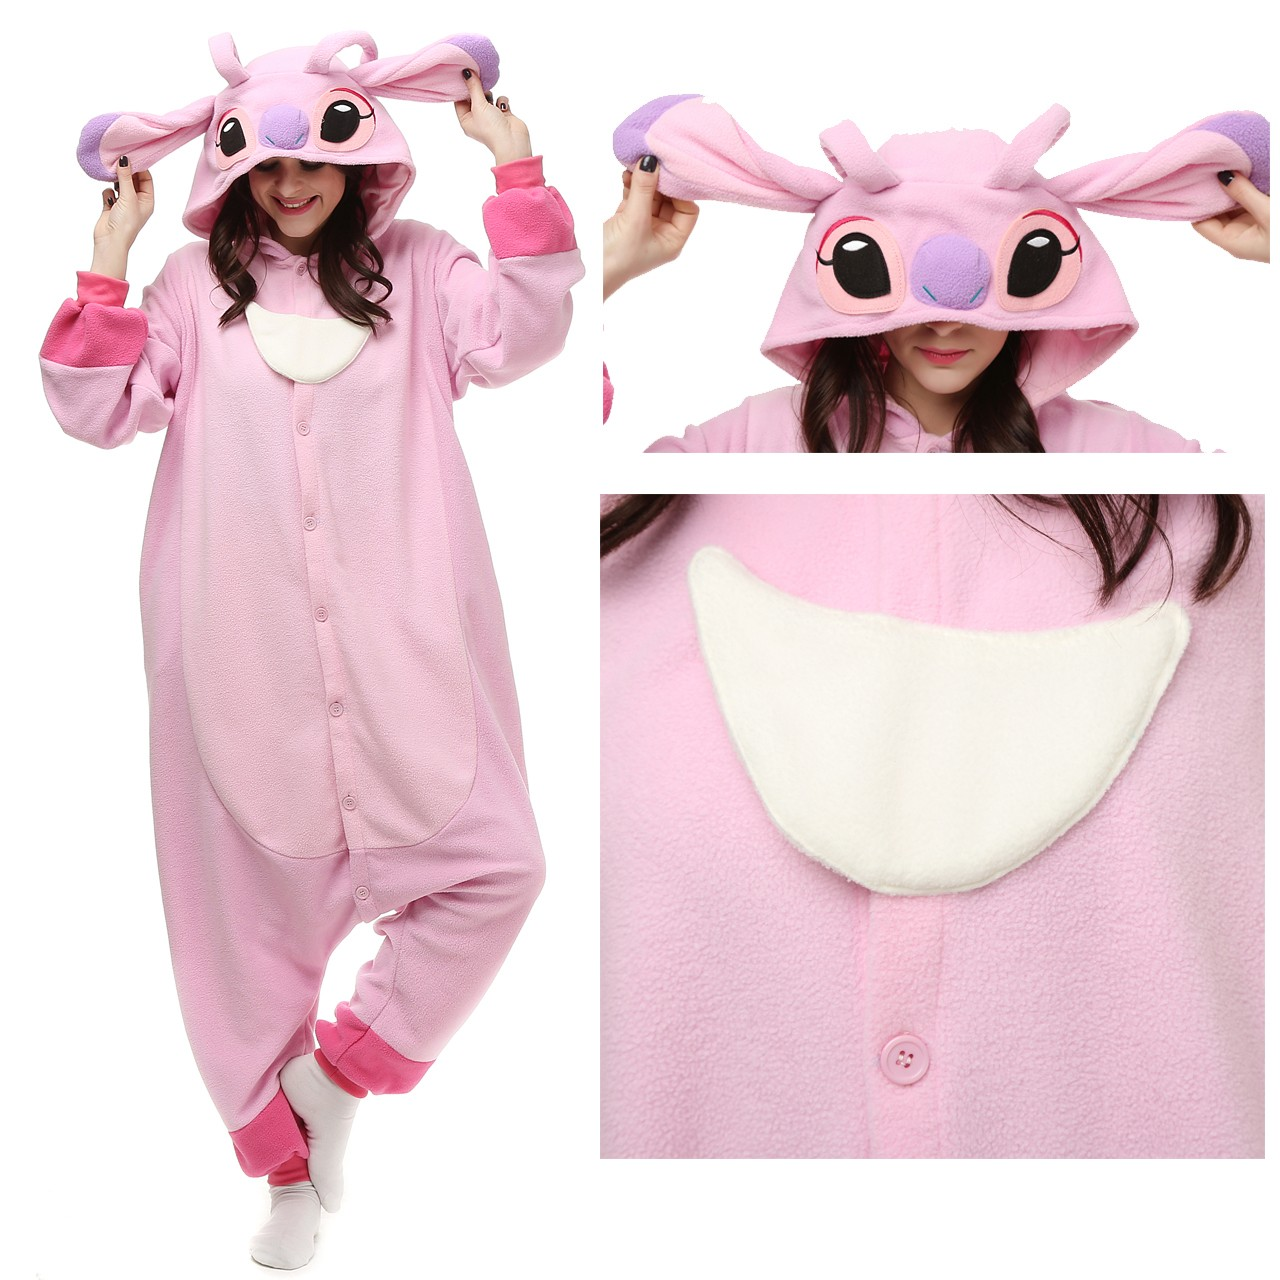 d33207bbb4e7 Disney Angel Stitch Onesie Kigurumi Pajamas Party Halloween Costumes